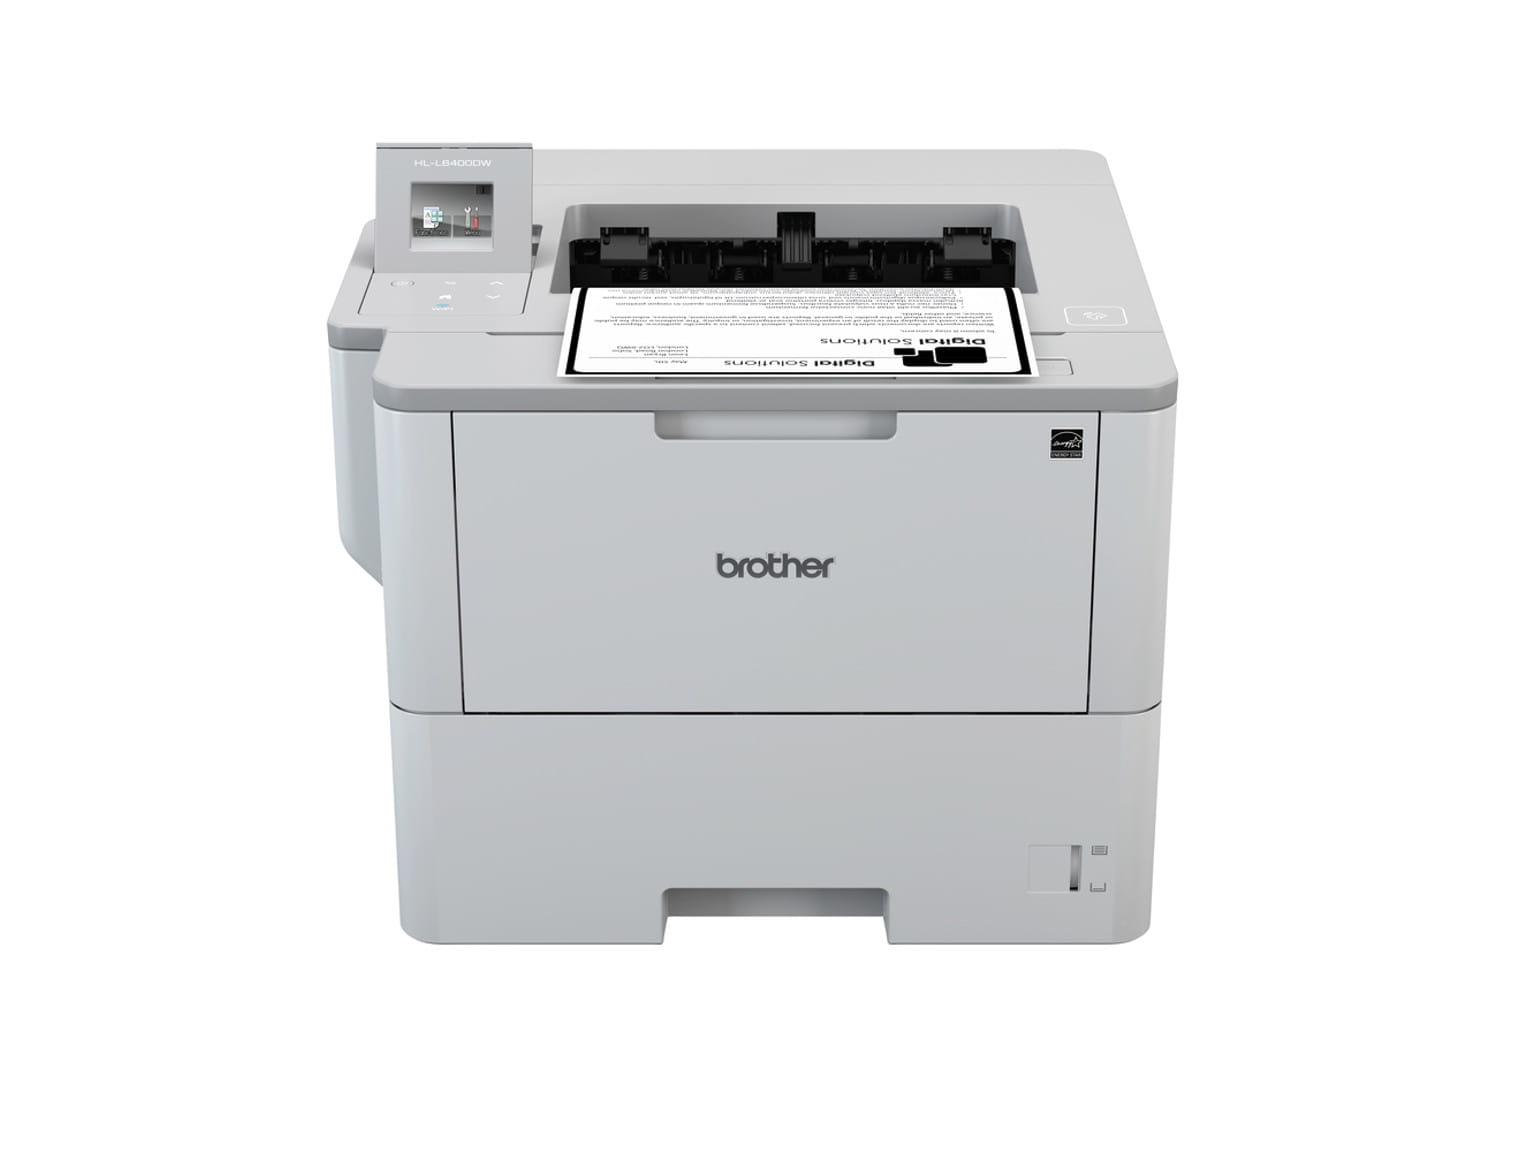 Impressoras Brother laser monocromáticas